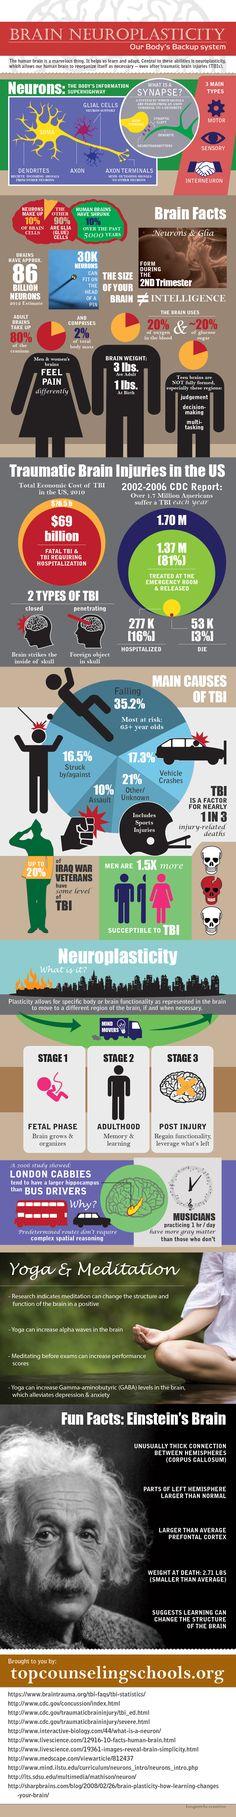 [WEB SITE] Neuroplasticity: The 10 Fundamentals Of Rewiring Your Brain | TBI Rehabilitation